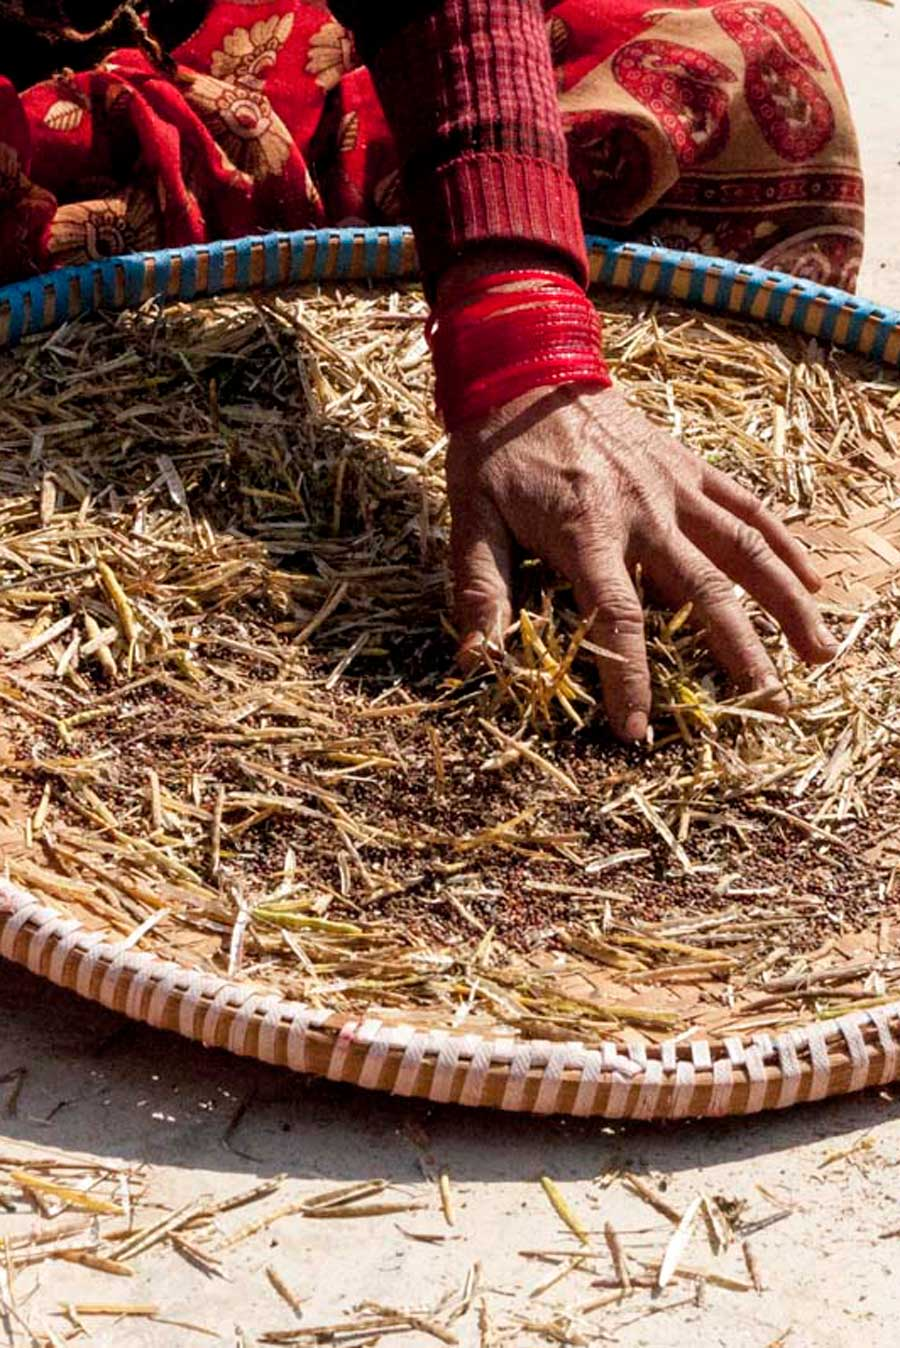 Tri de la moutarde noire, en Inde